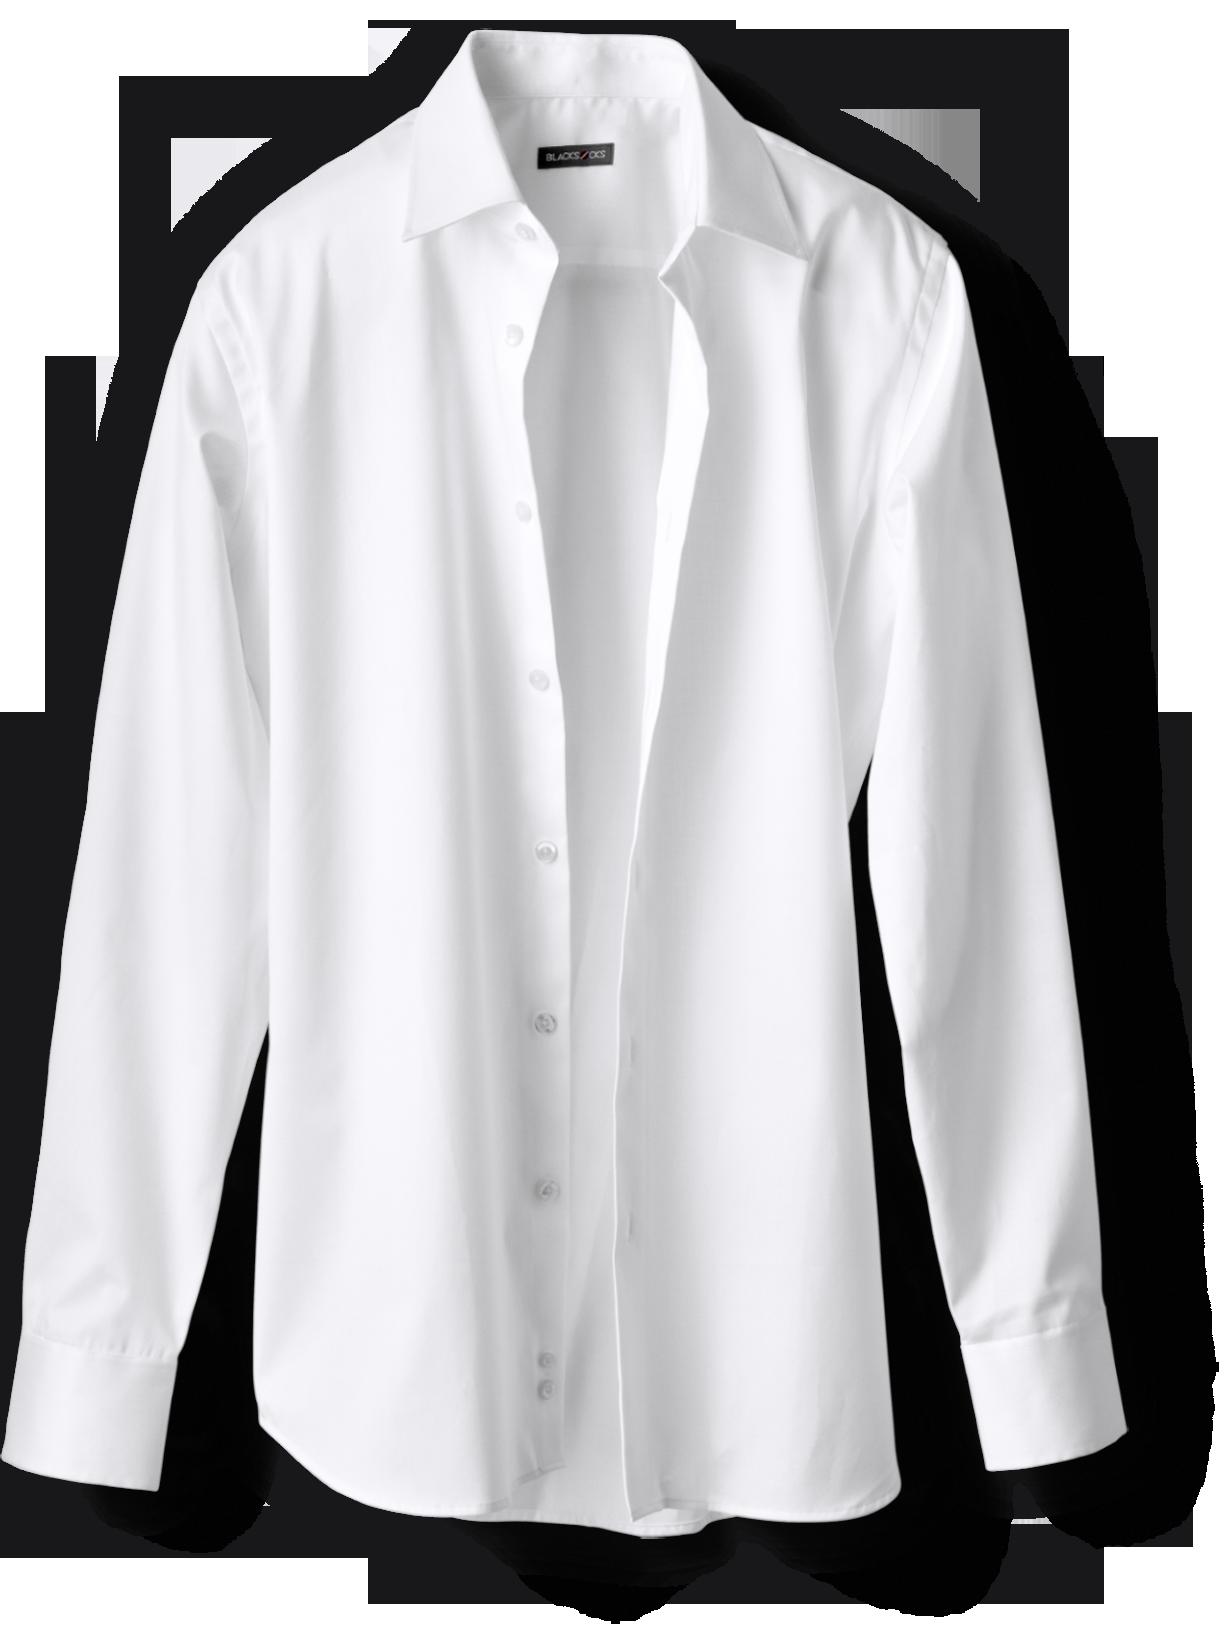 Lucienne - das taillierte Business-Hemd - PNG Hemd